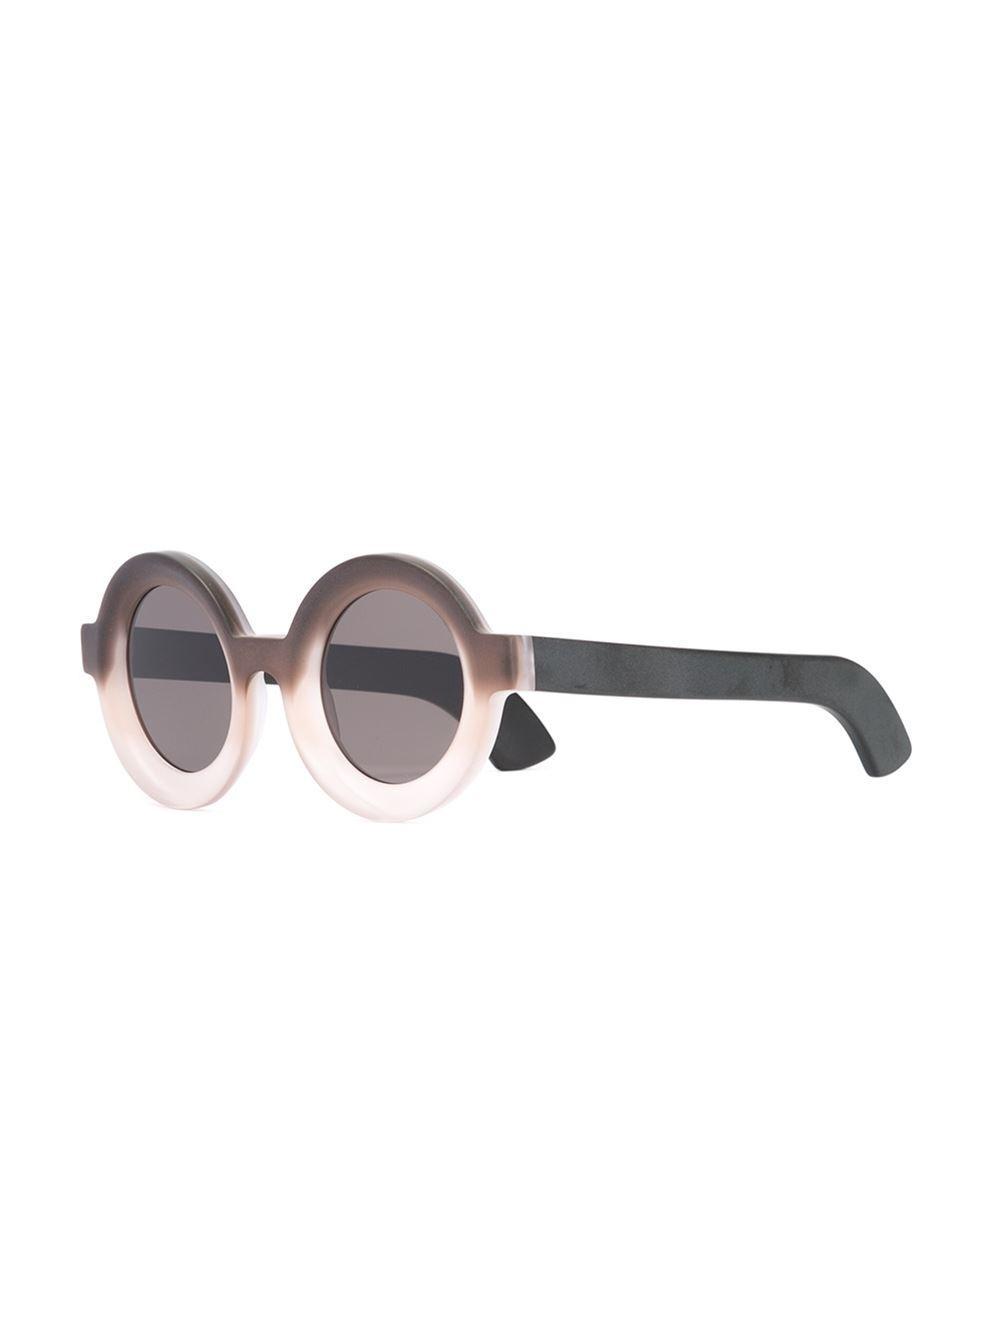 Kuboraum Julius 'maske 7' Sunglasses in Black